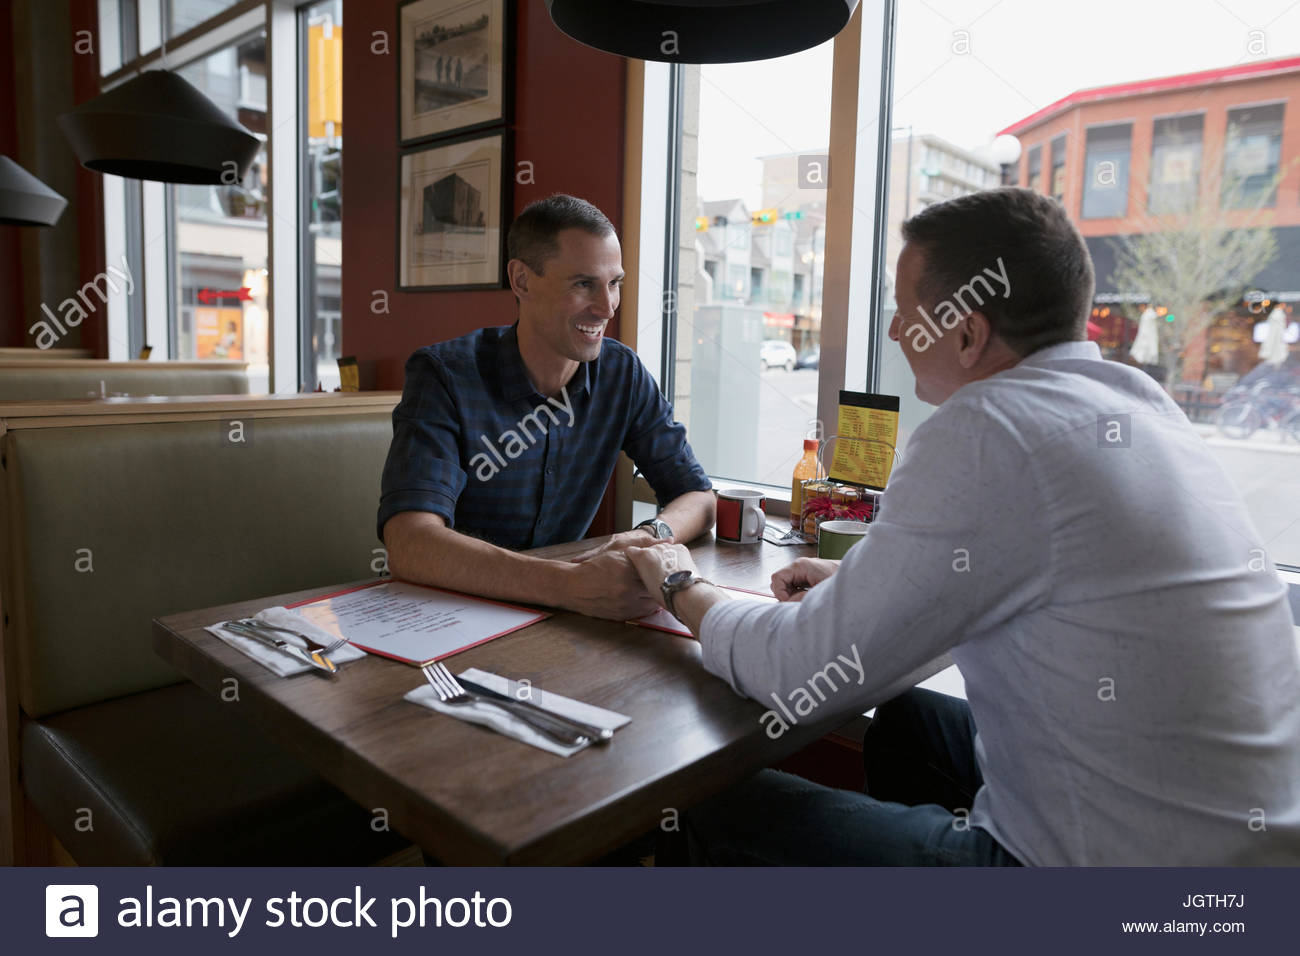 Afectuosa pareja homosexual masculina en manos diner booth Imagen De Stock